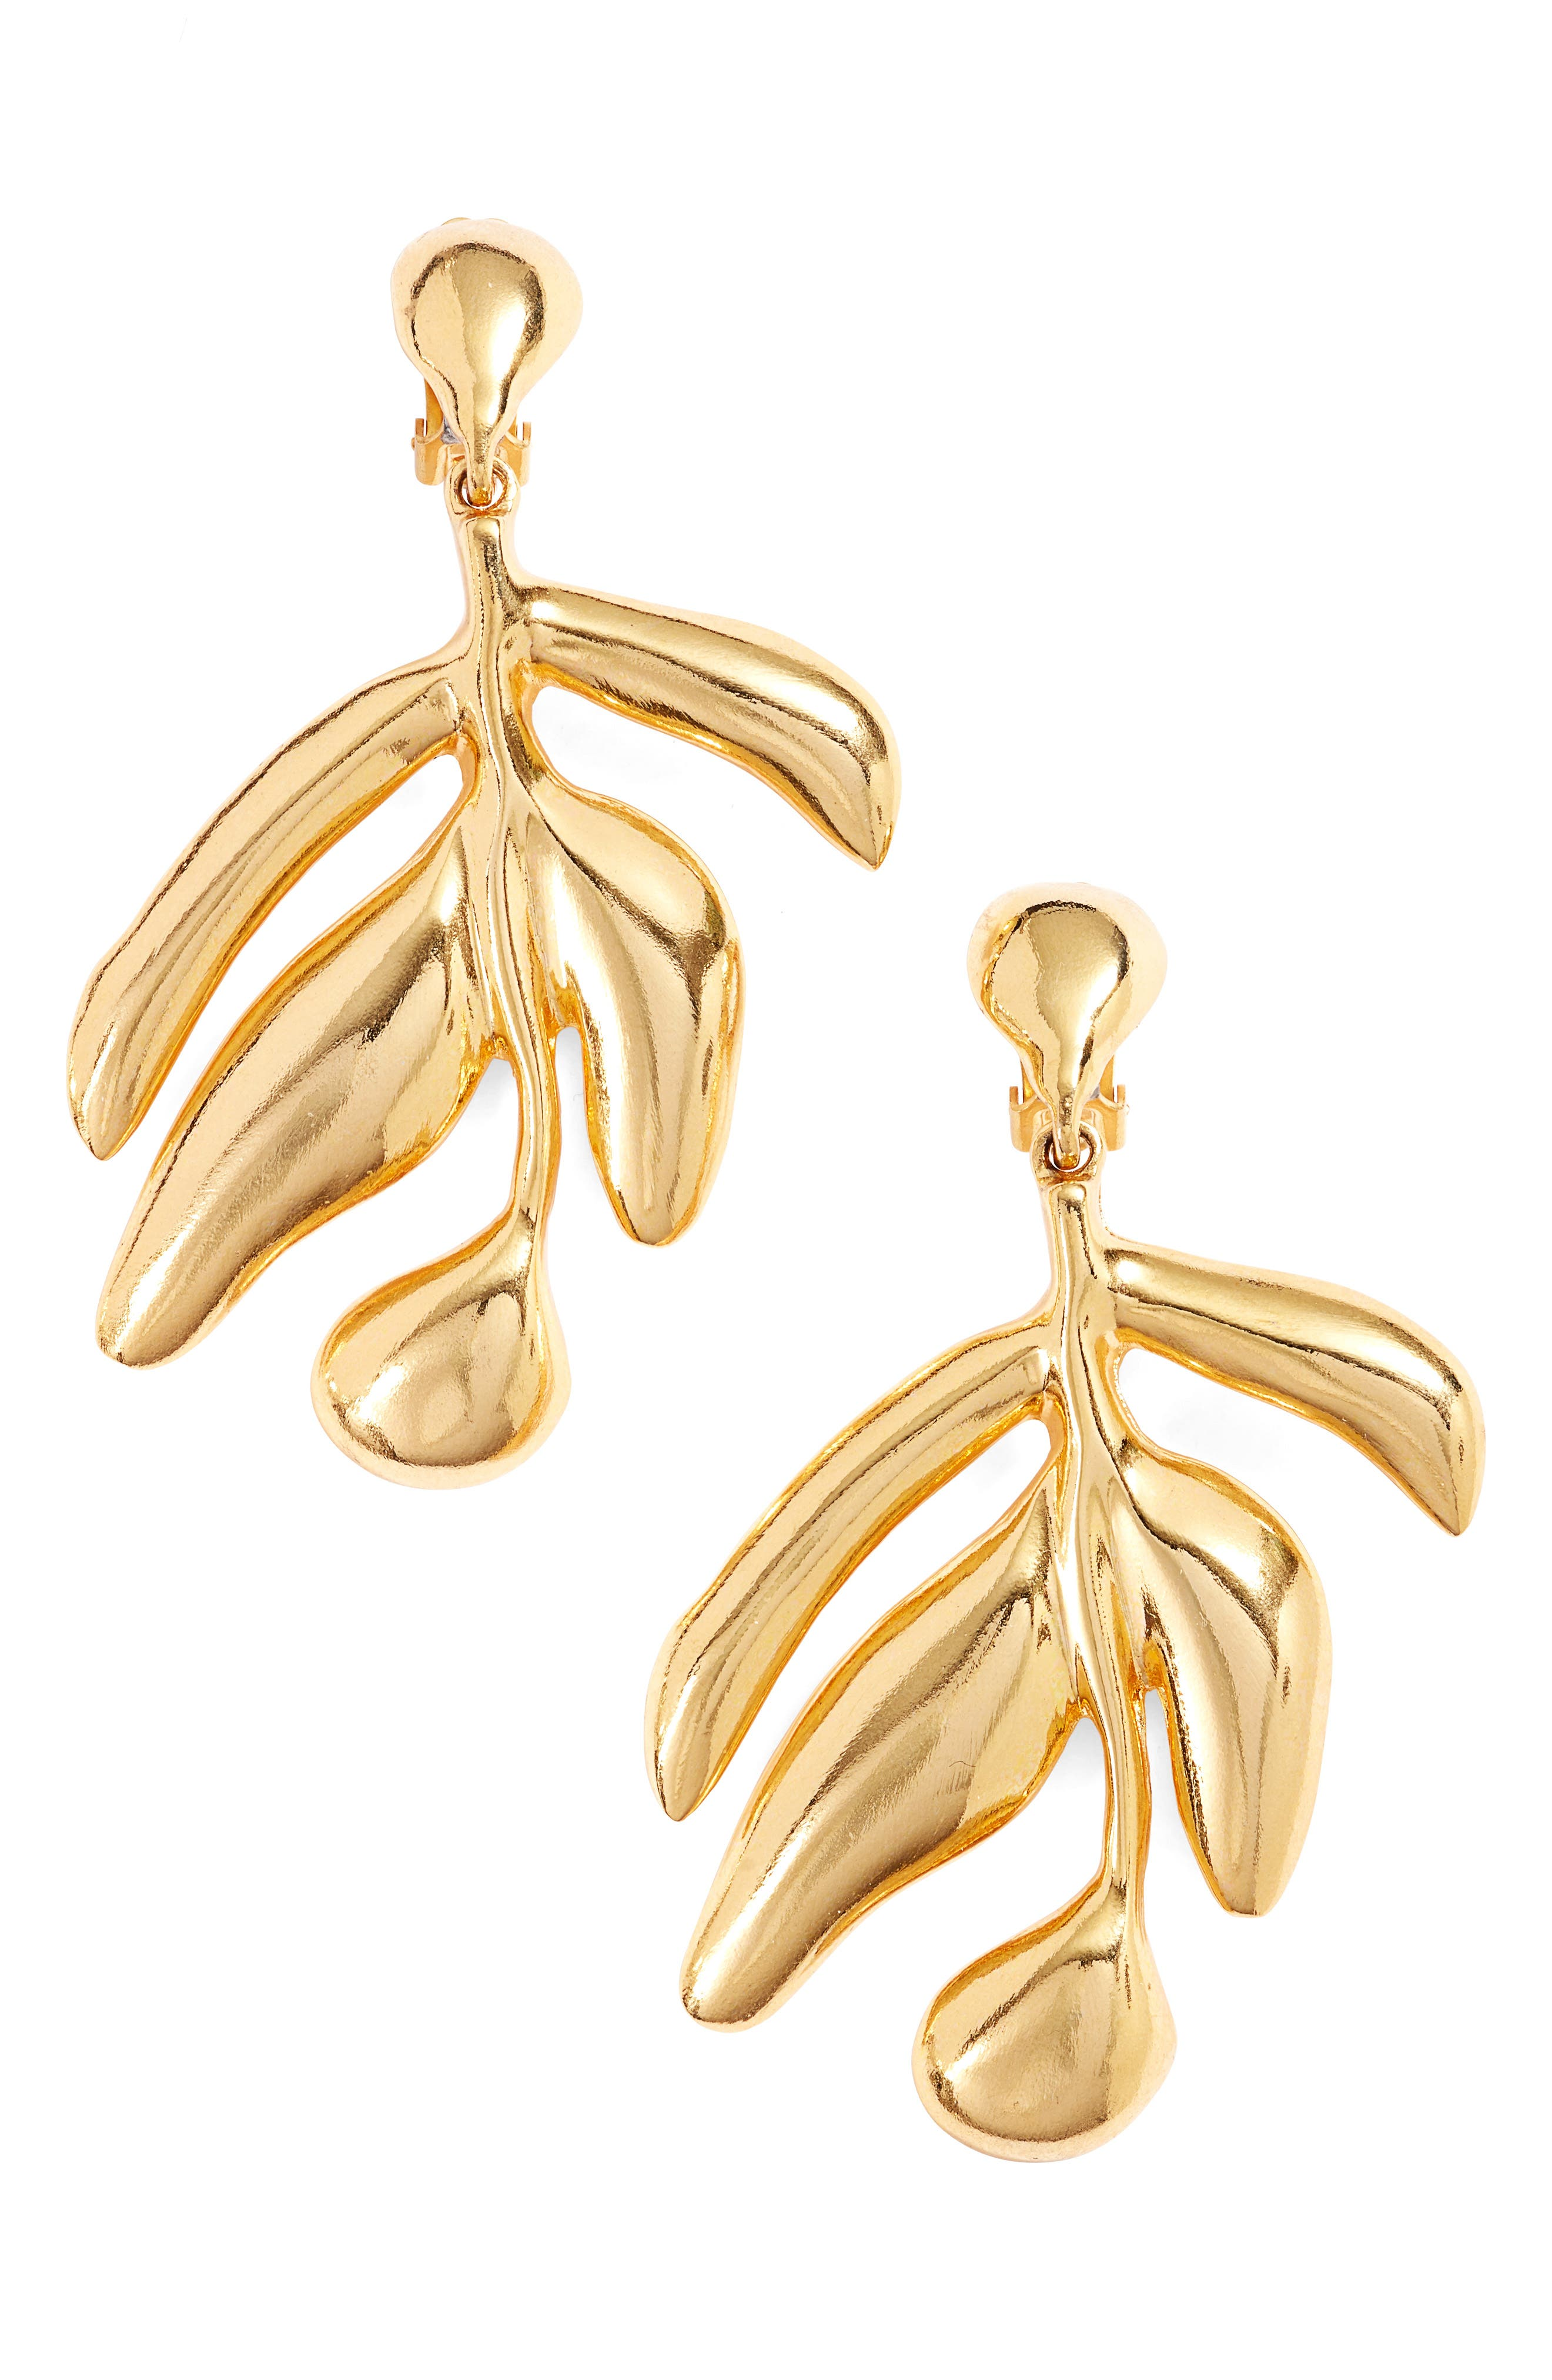 Oscar de la Renta Small Graphic Botanic Earrings